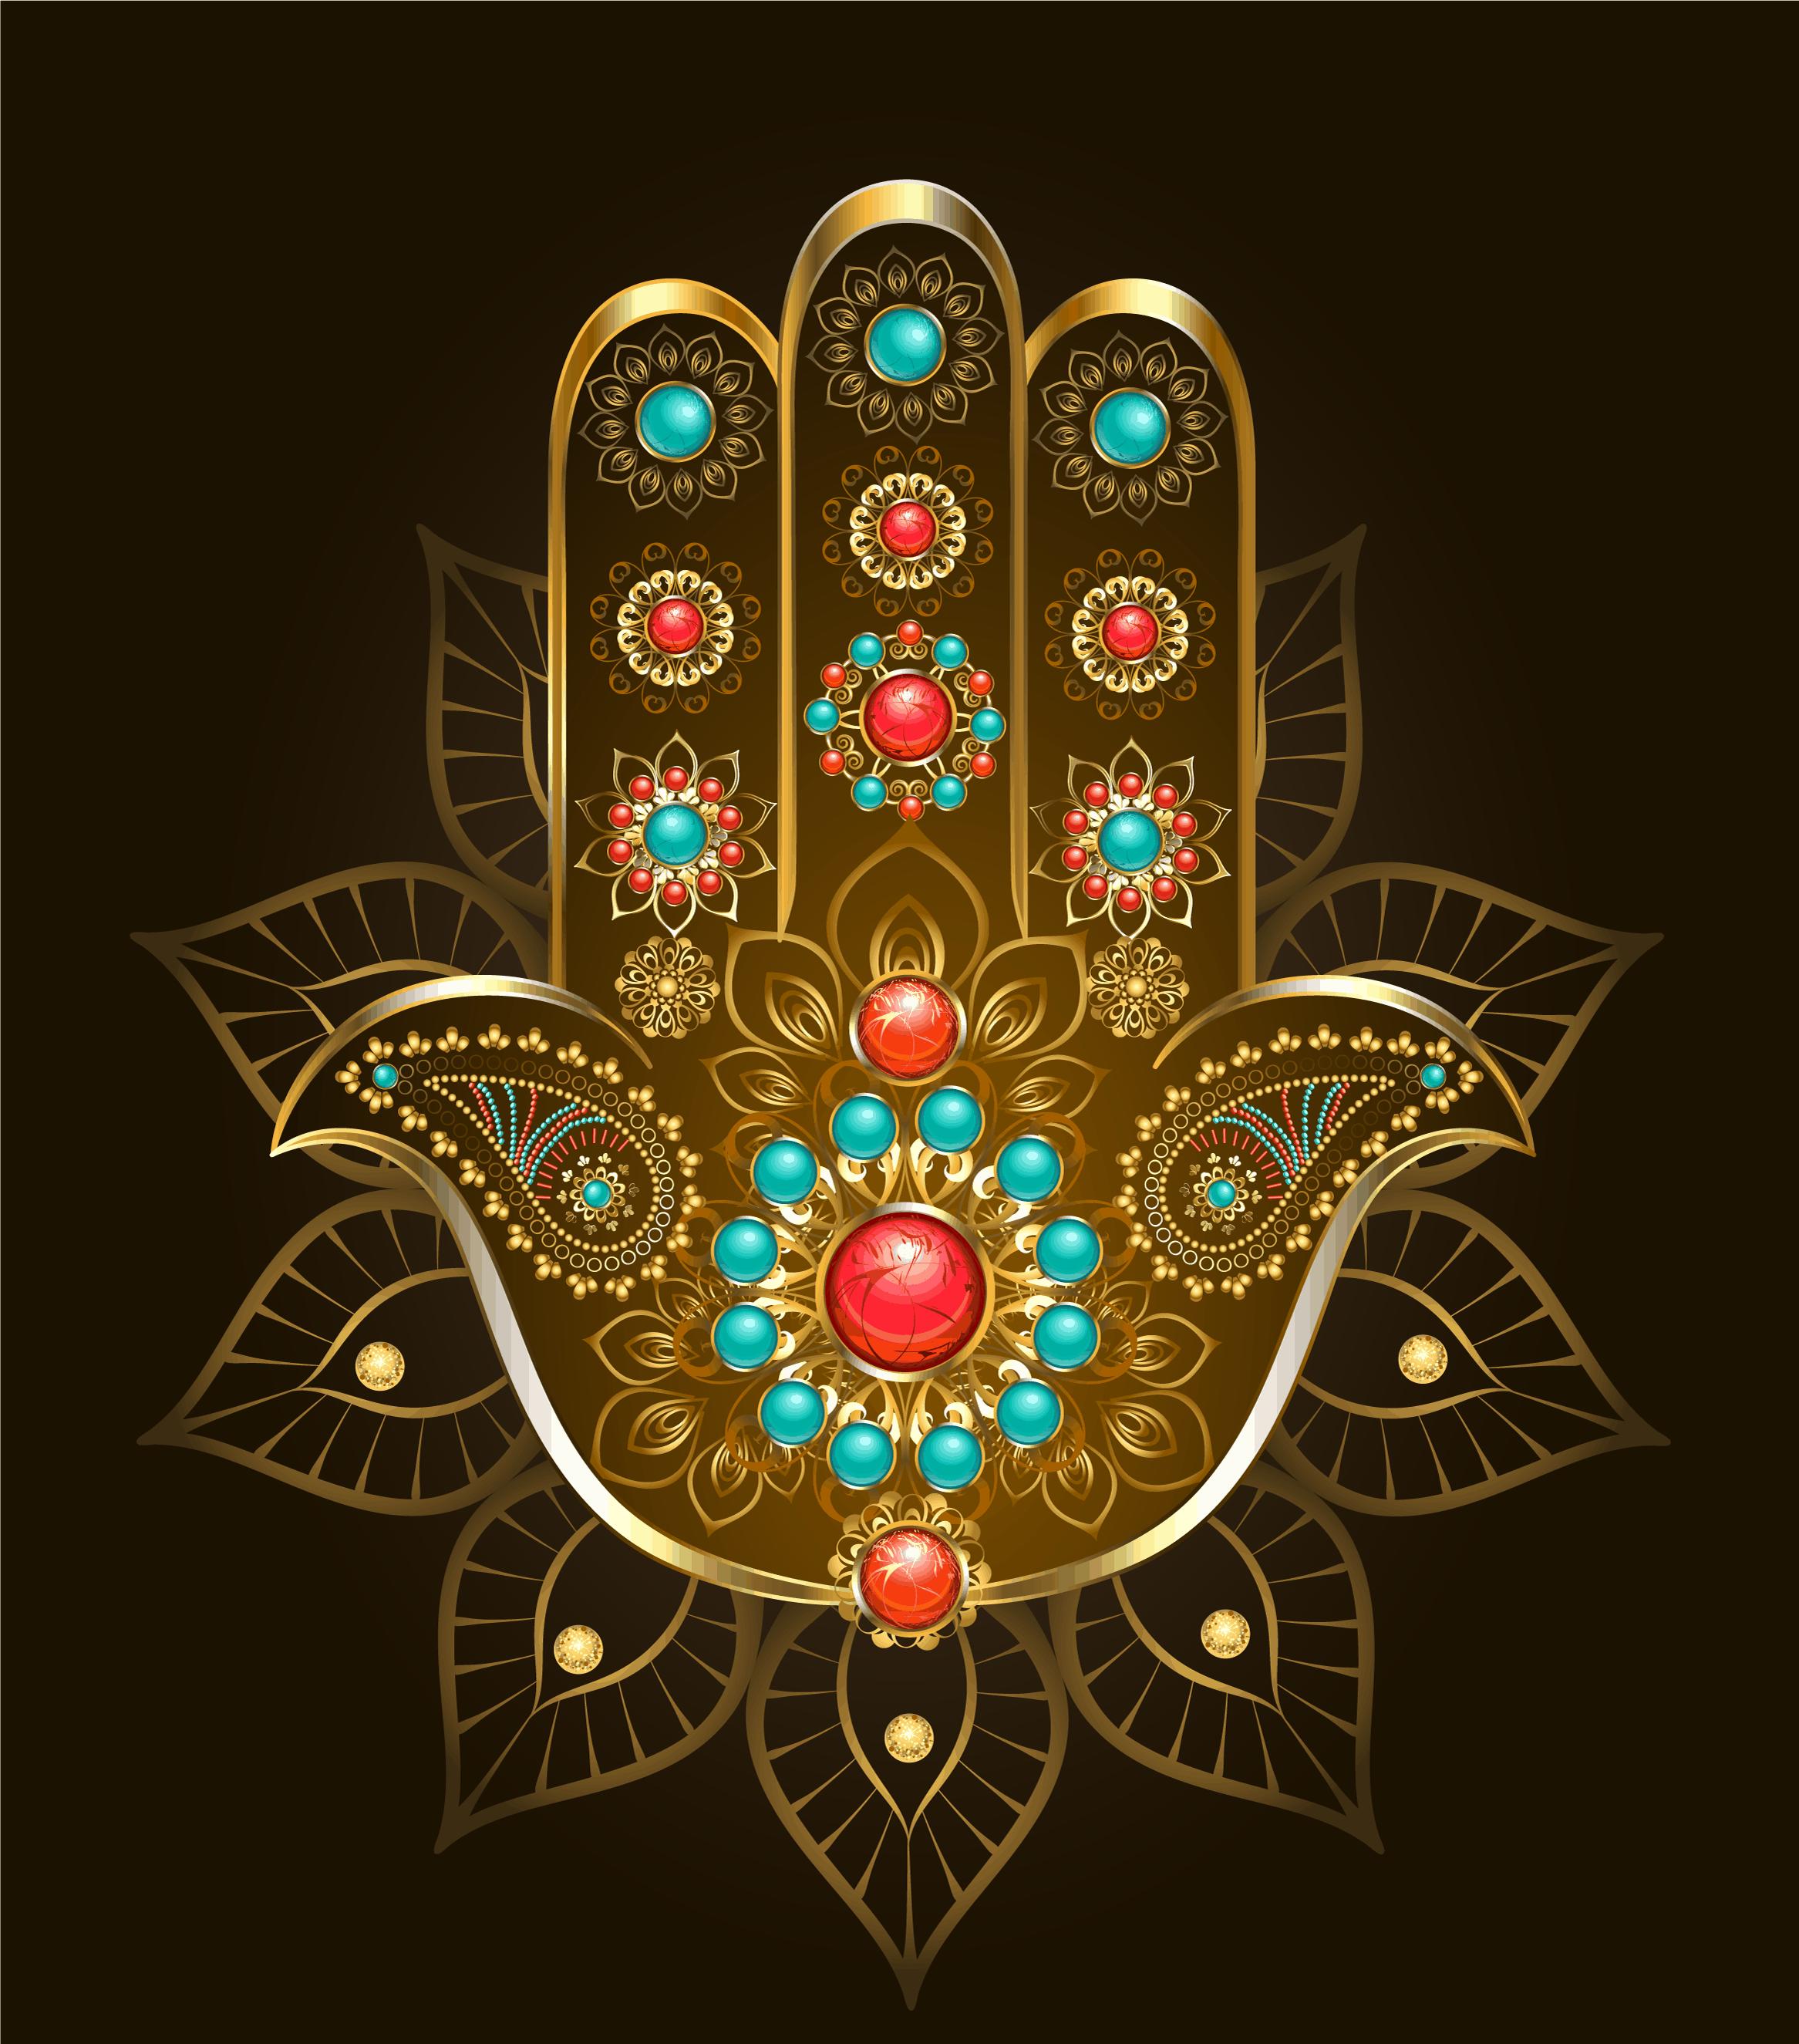 Hamsa Hand Meaning, Symbolism And Origin: The Evil Eye Talisman